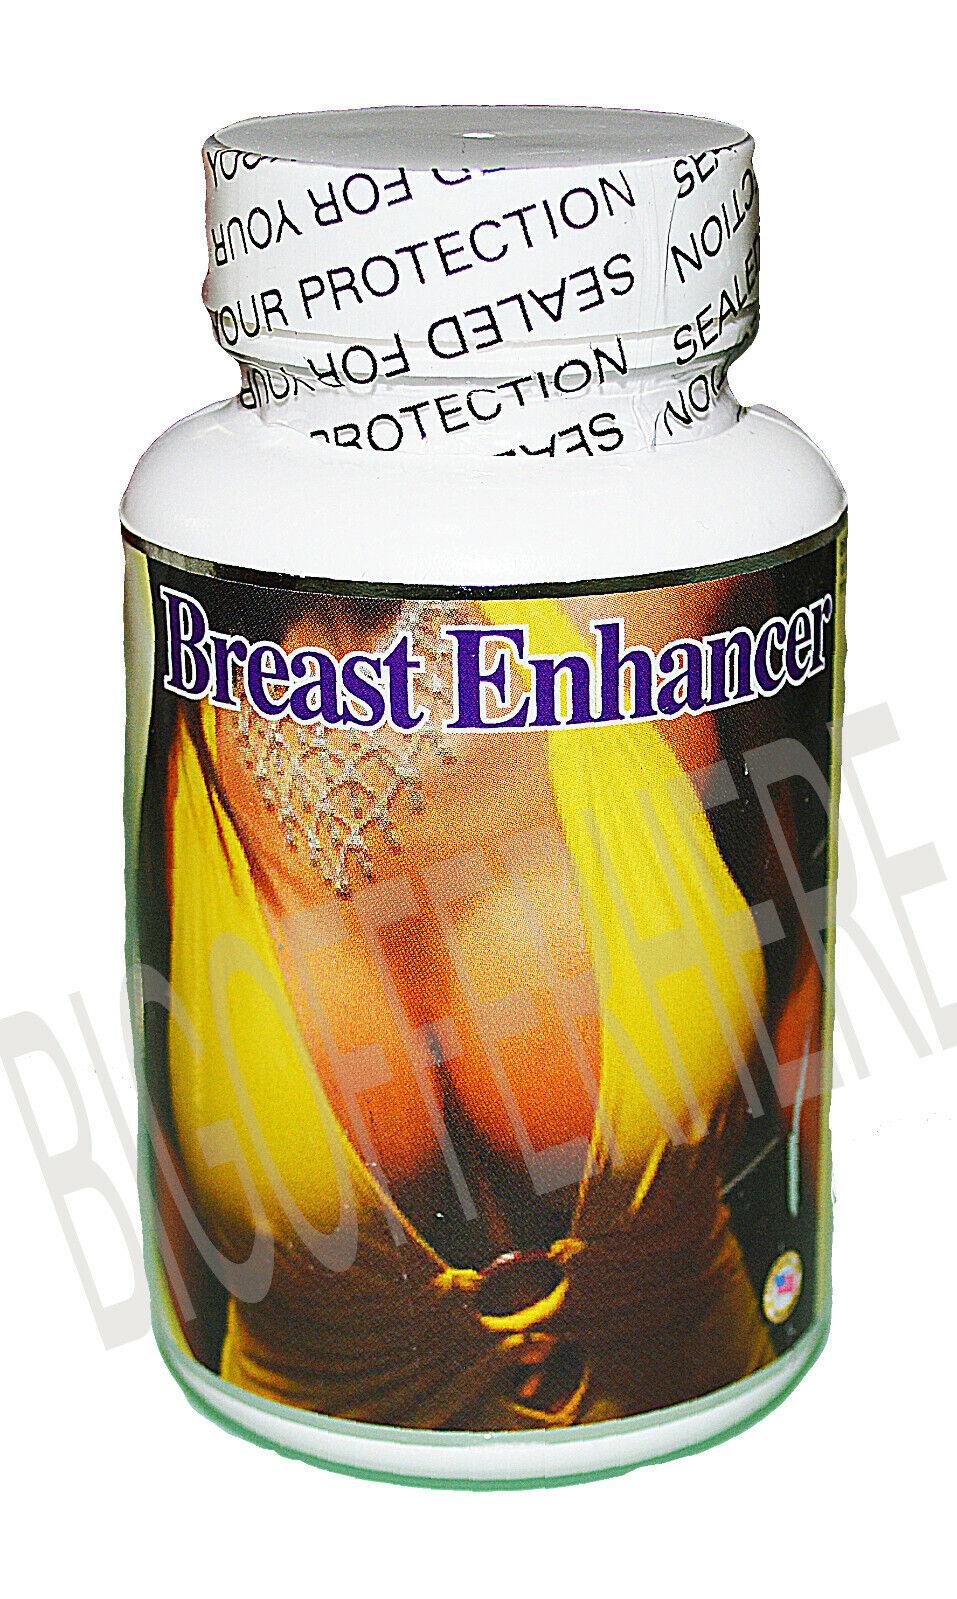 MOST EFFECTIVE Breast Enlargement Pills Enhancement Herb Female Hormone Estrogen 1